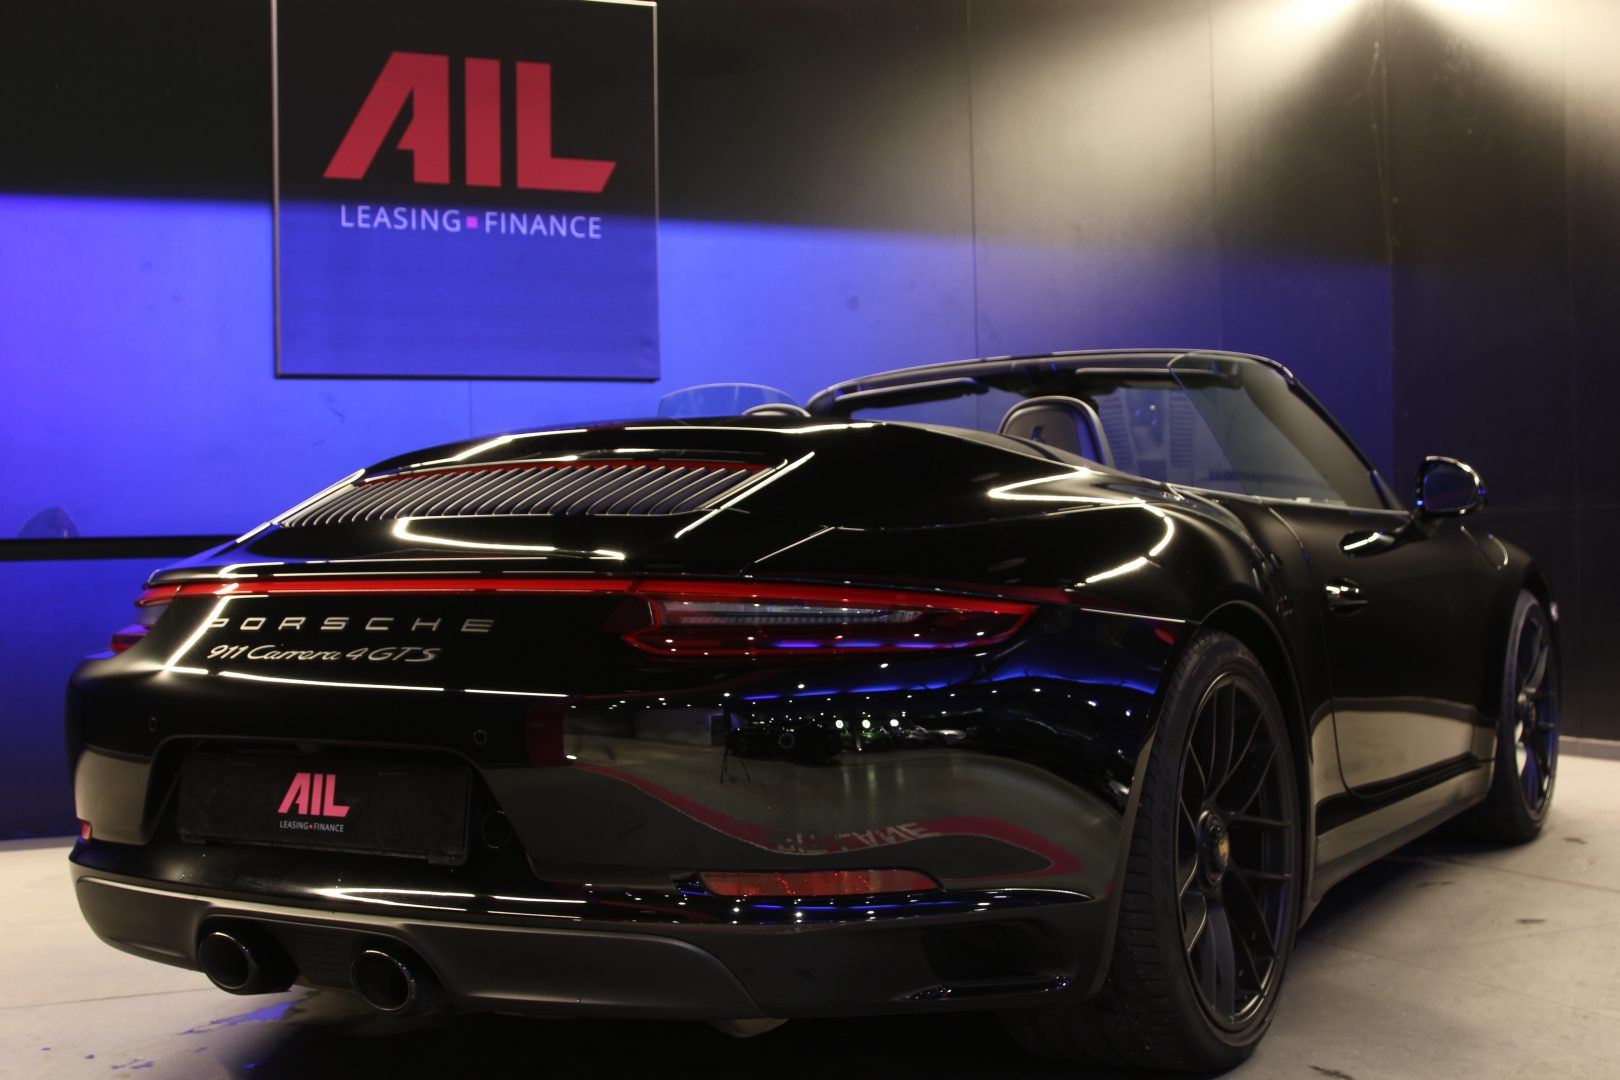 AIL Porsche 991 4 GTS Cabriolet LED Burmester High-End 9